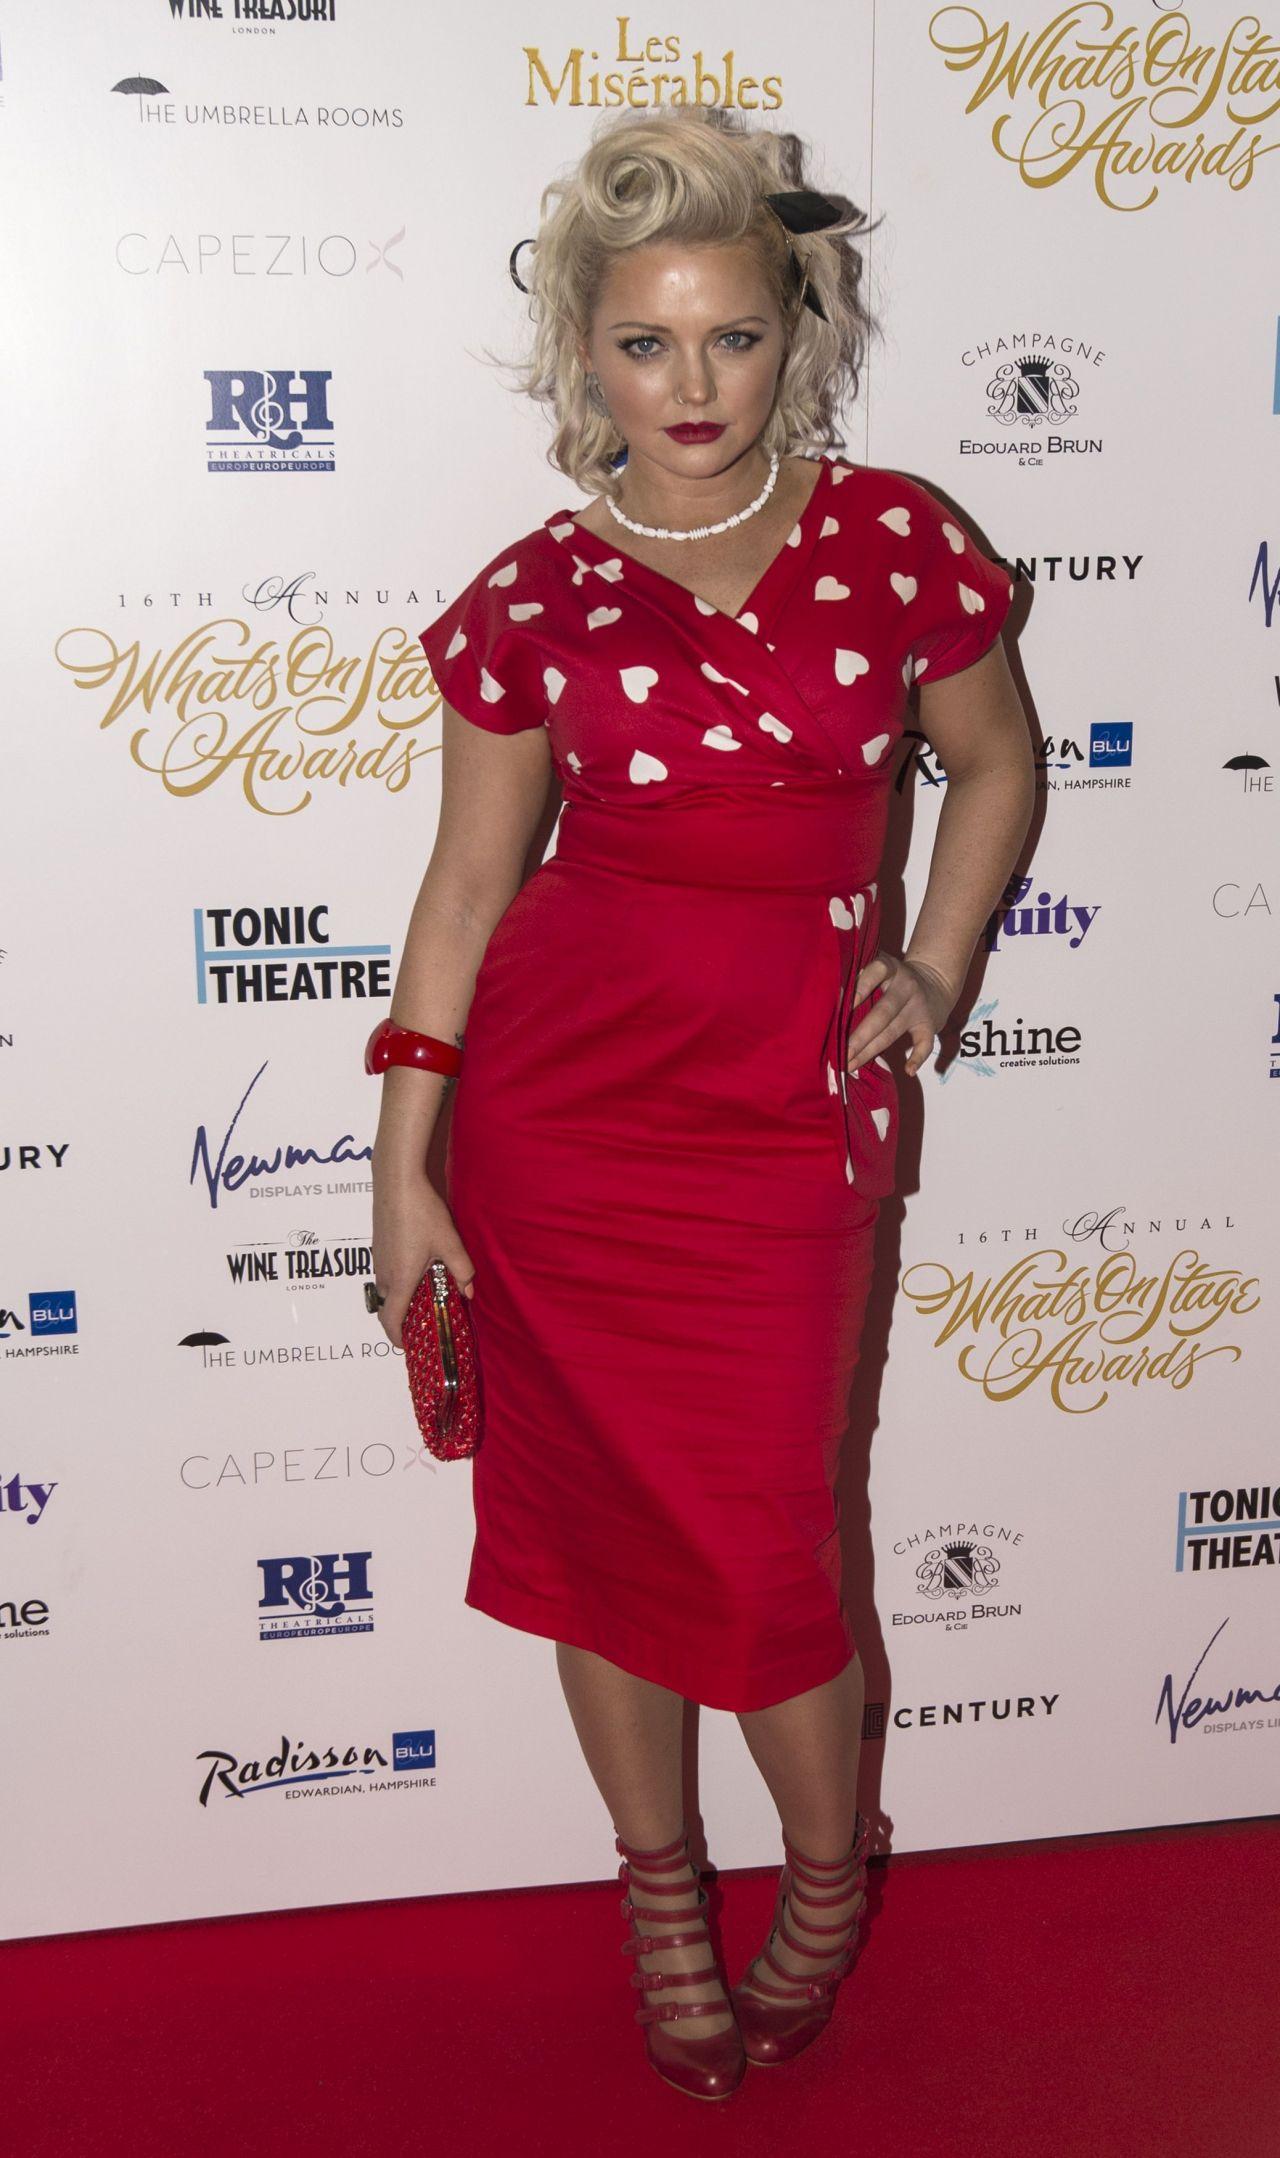 Hannah Spearritt 2016 Whatsonstage Awards In London